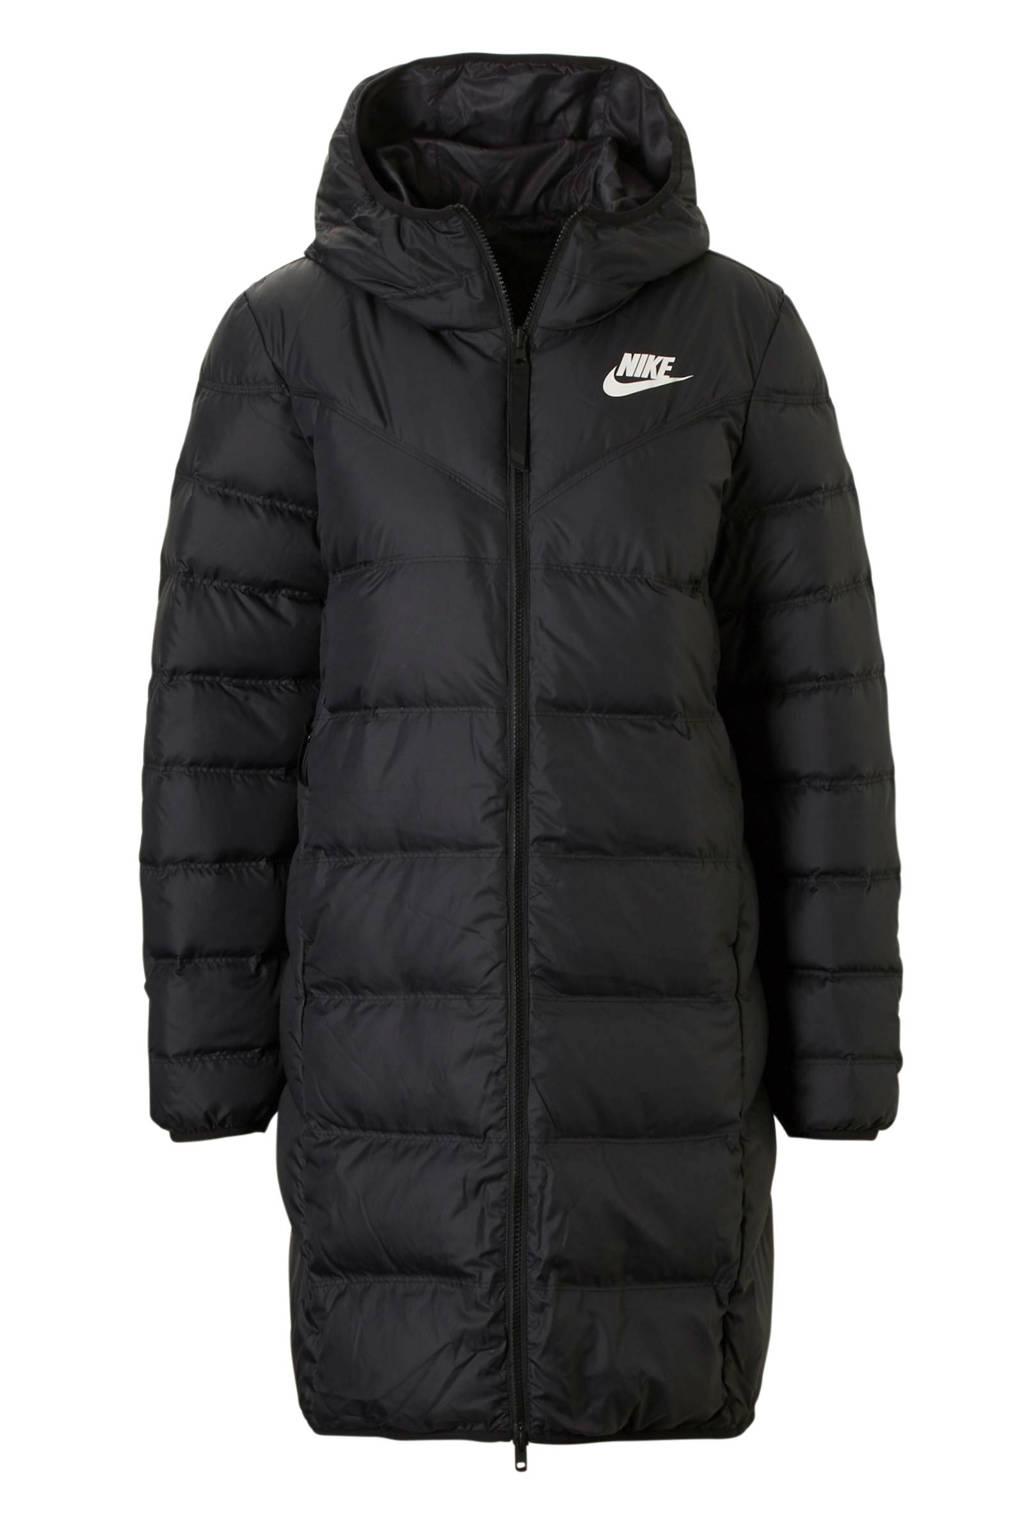 Nike omkeerbare halflange jas, Zwart/wit